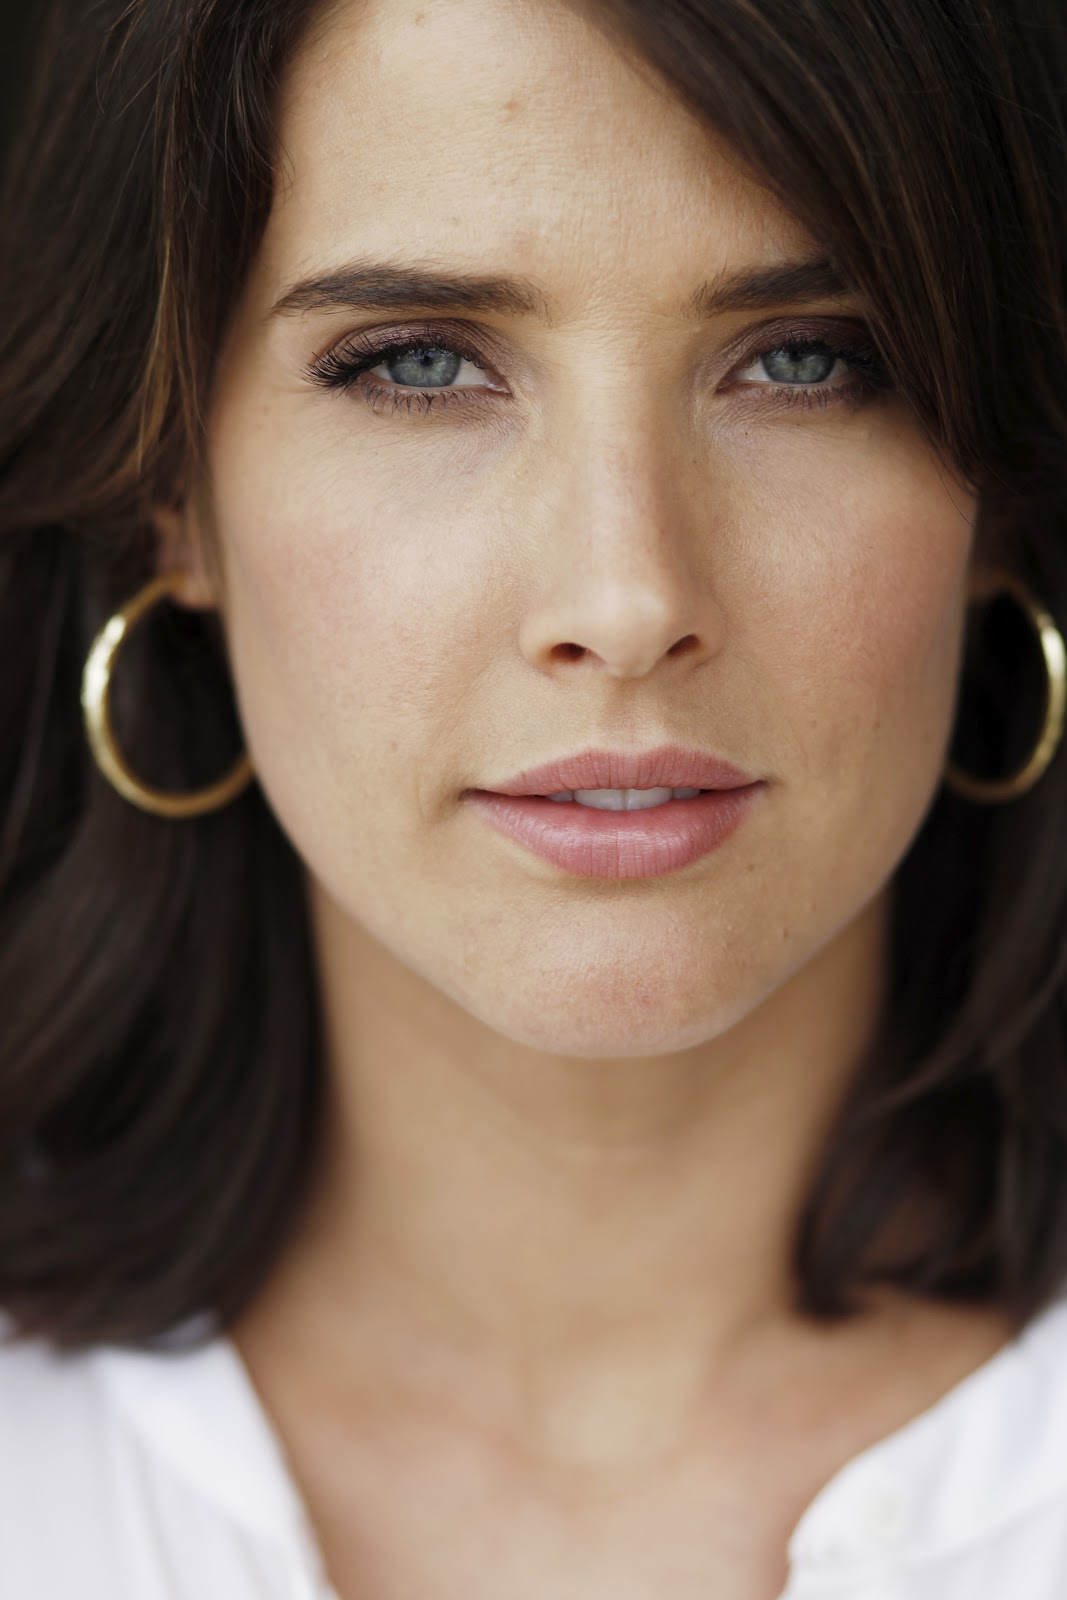 Cobie Smulders so beautiful latest Matt Sayles Photoshoot